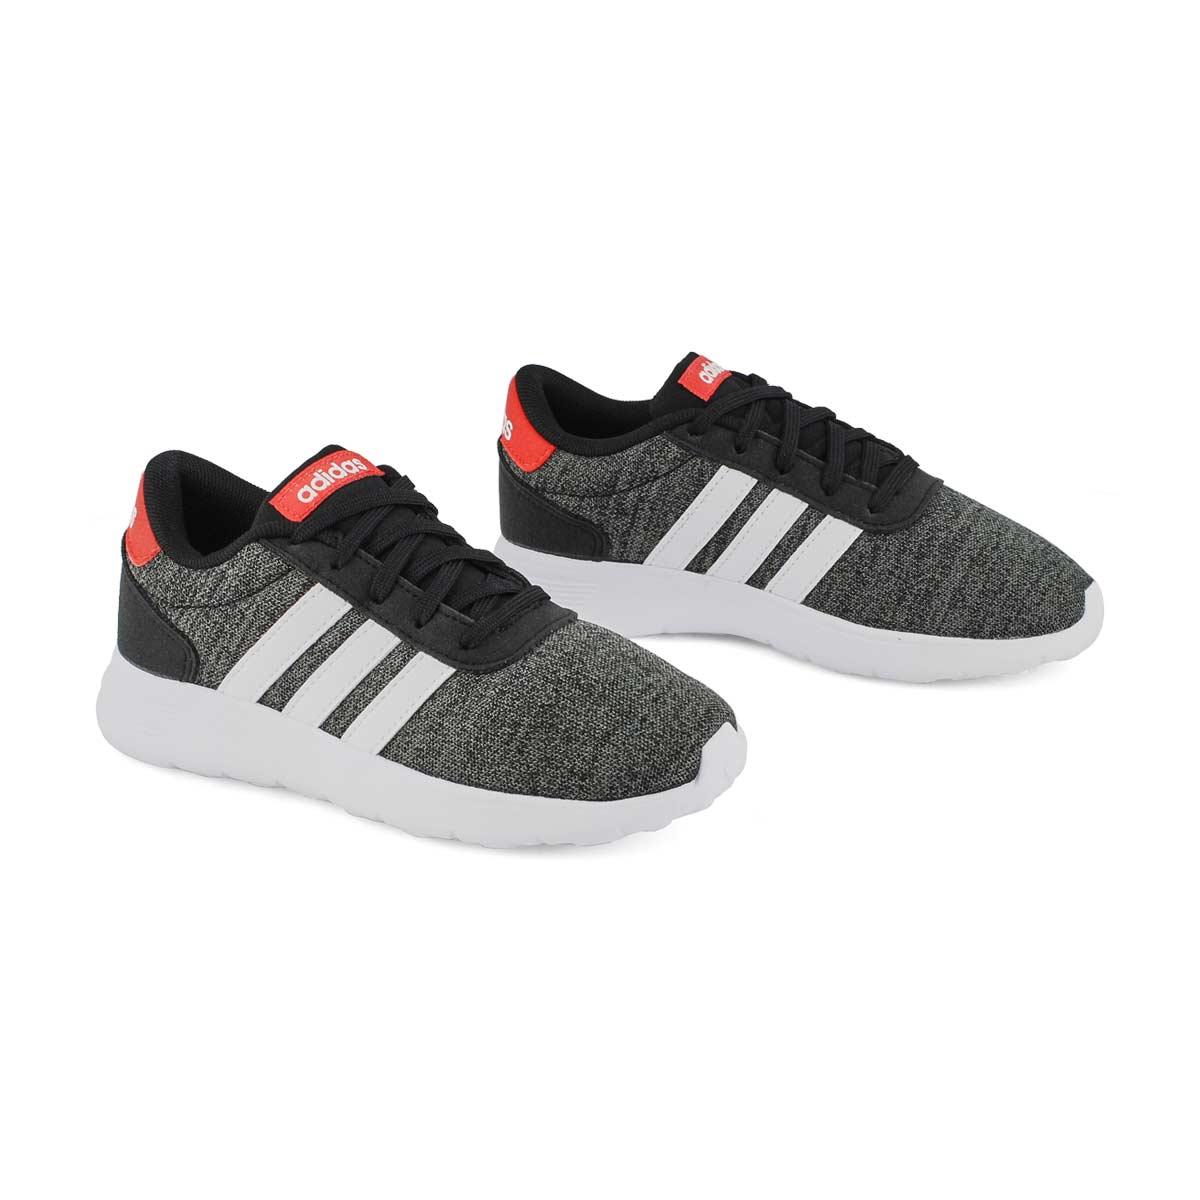 Kds Lite Racer K blk/wht running shoe